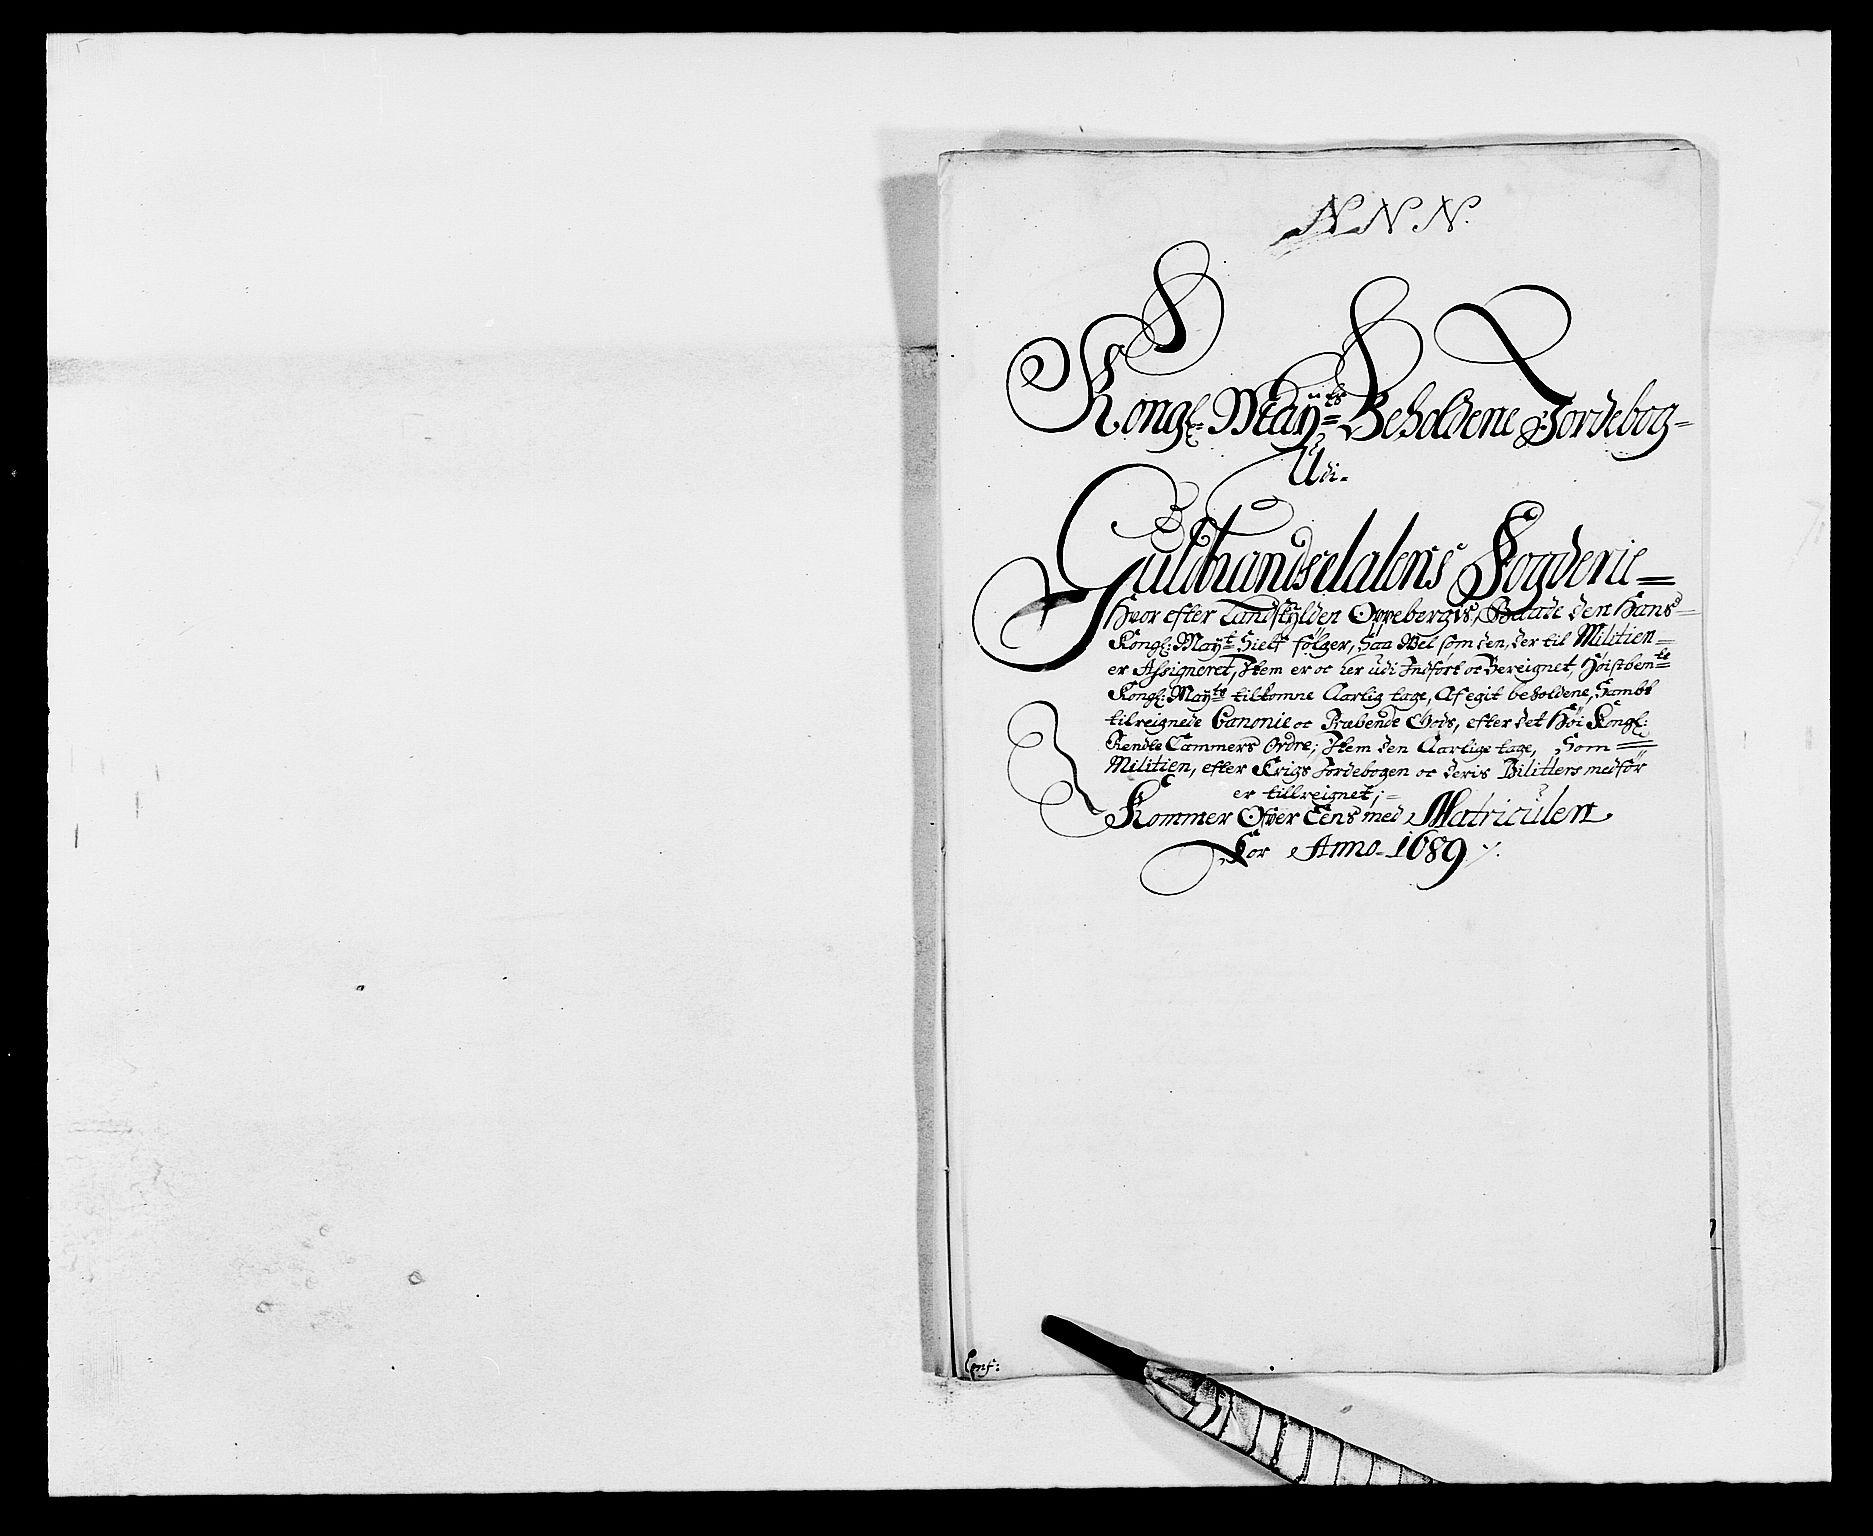 RA, Rentekammeret inntil 1814, Reviderte regnskaper, Fogderegnskap, R17/L1164: Fogderegnskap Gudbrandsdal, 1682-1689, s. 78